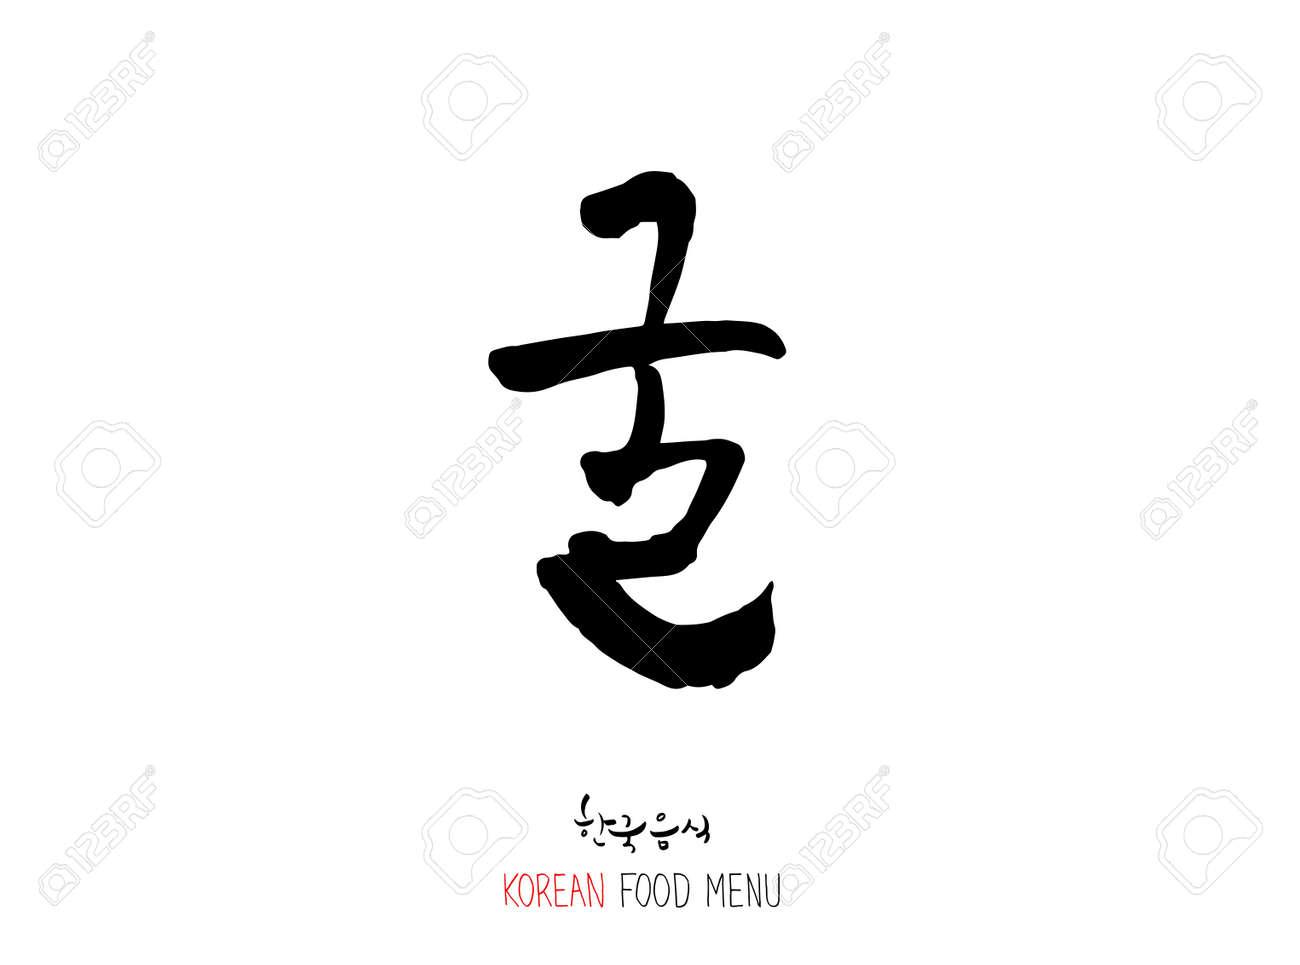 Korean language - Type of Seafood menu / fish and seaweed / Name